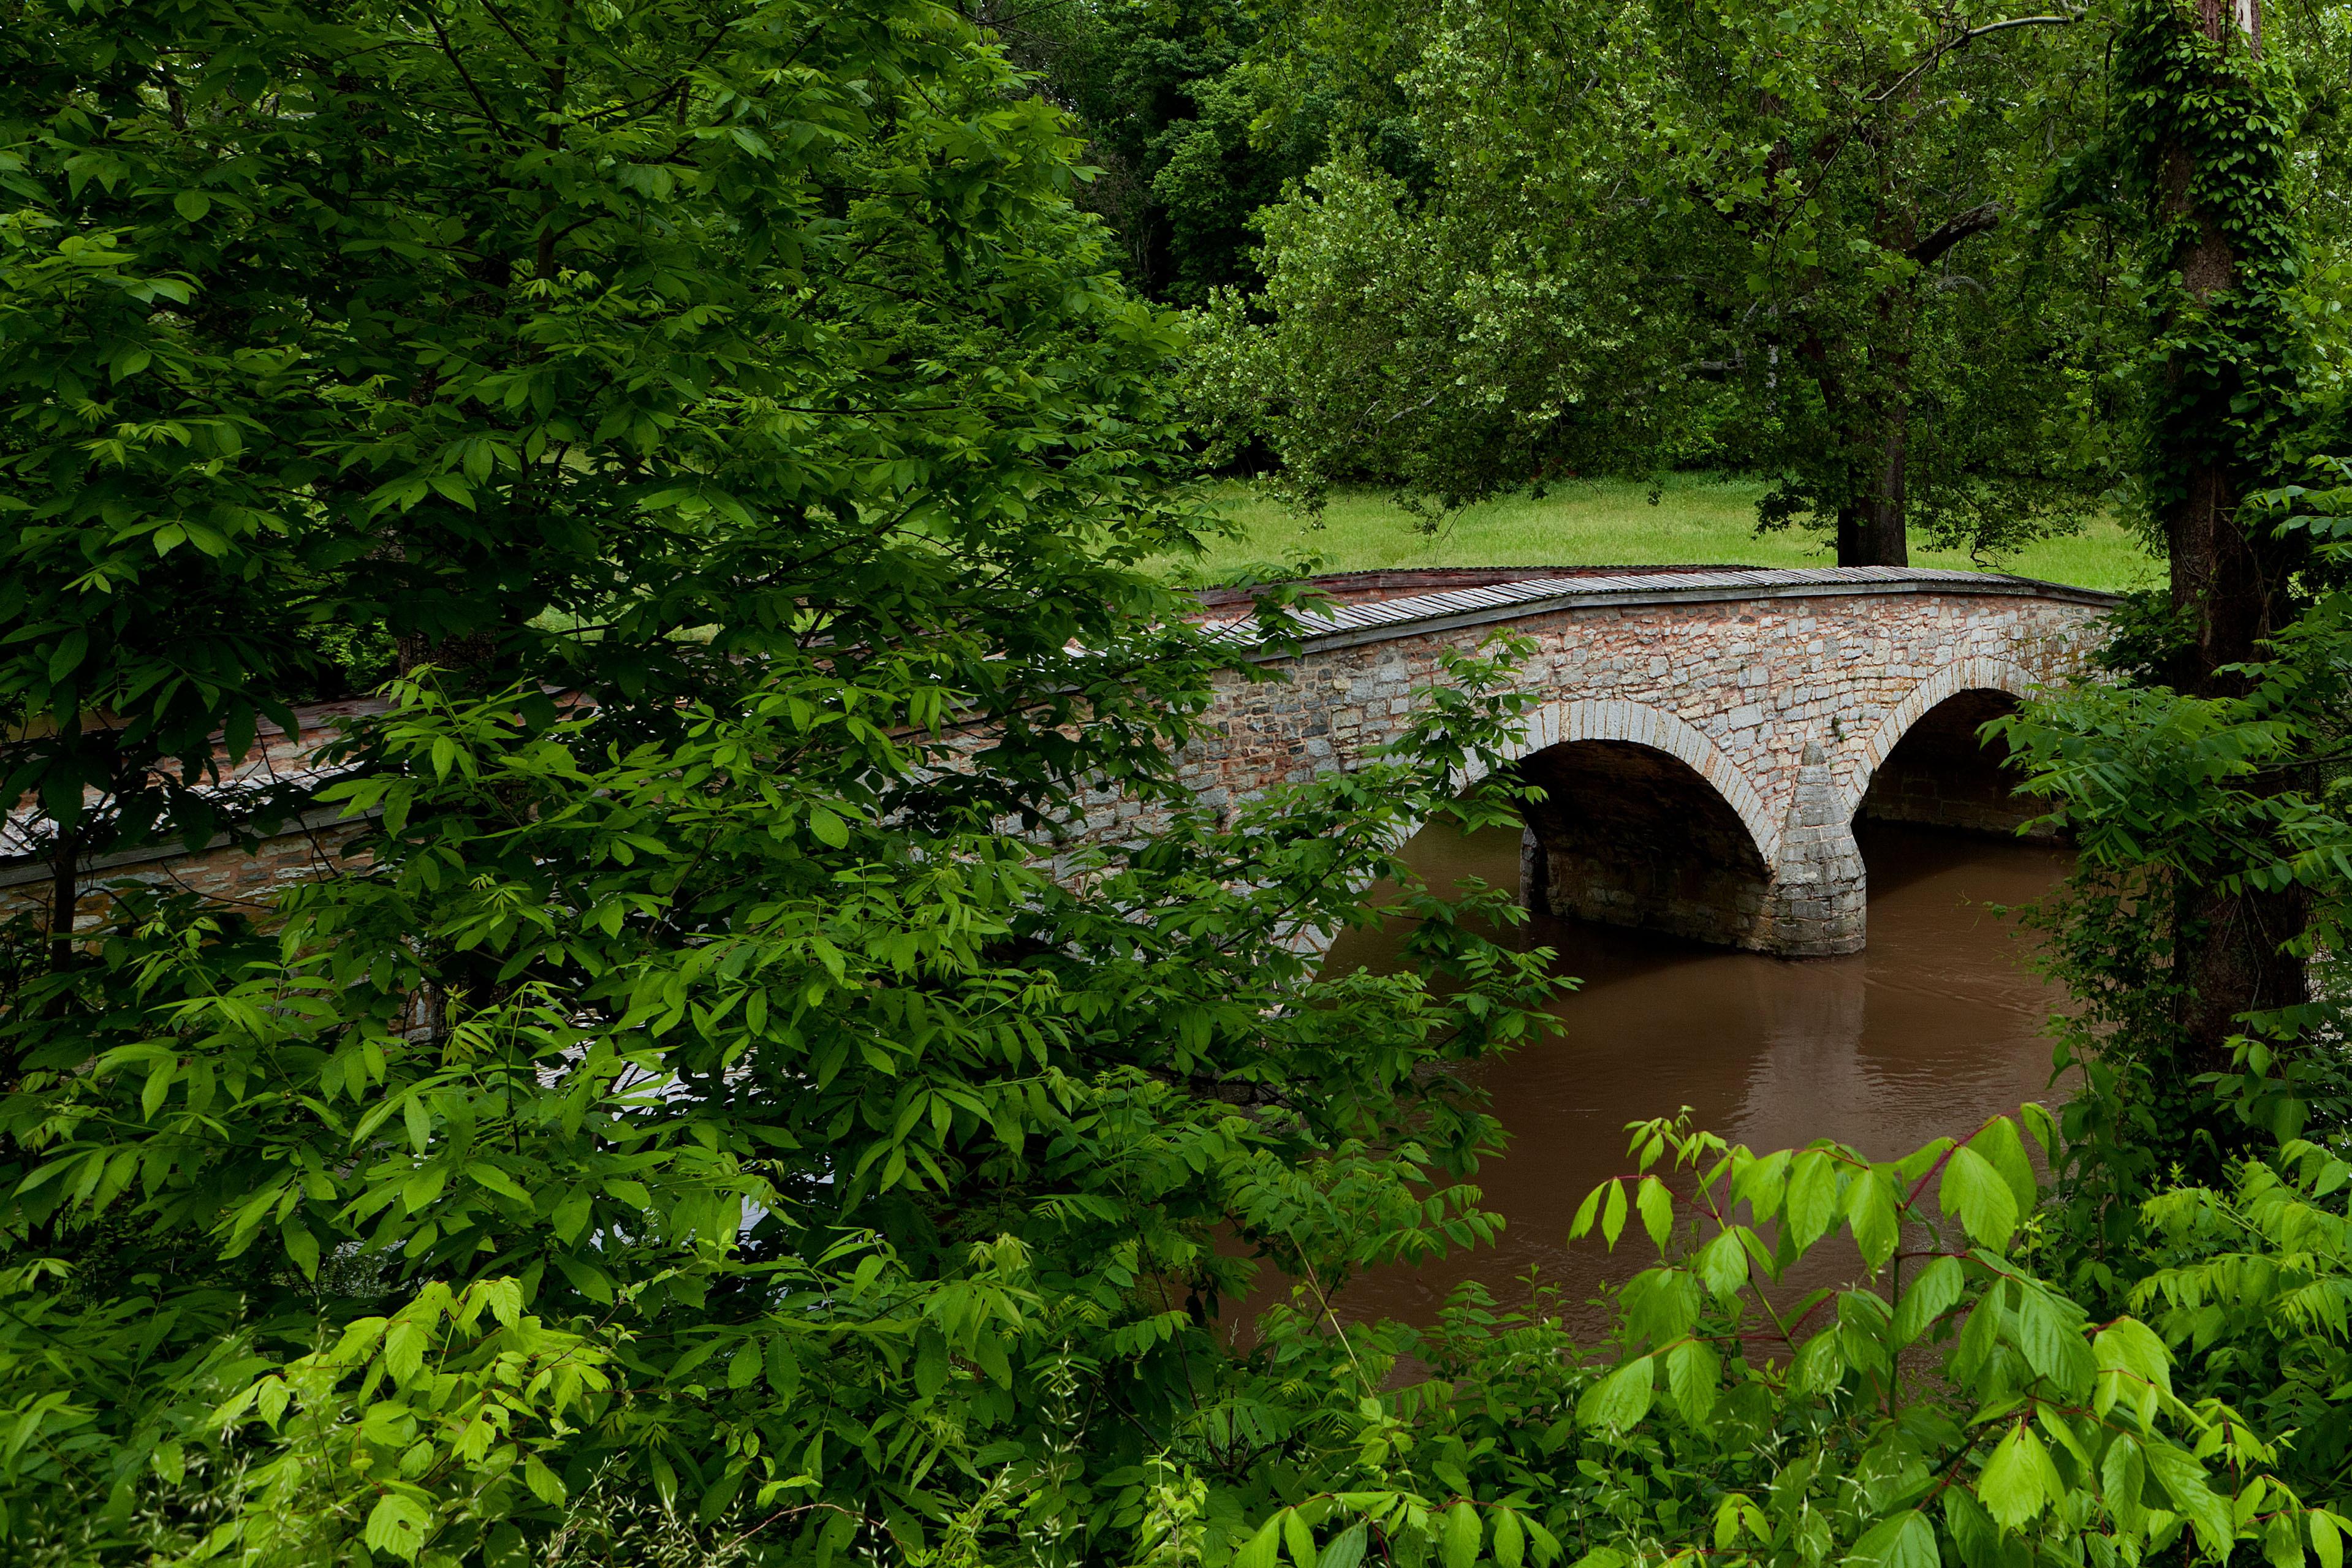 природа страны архитектура река мост Александр  № 2234636 бесплатно